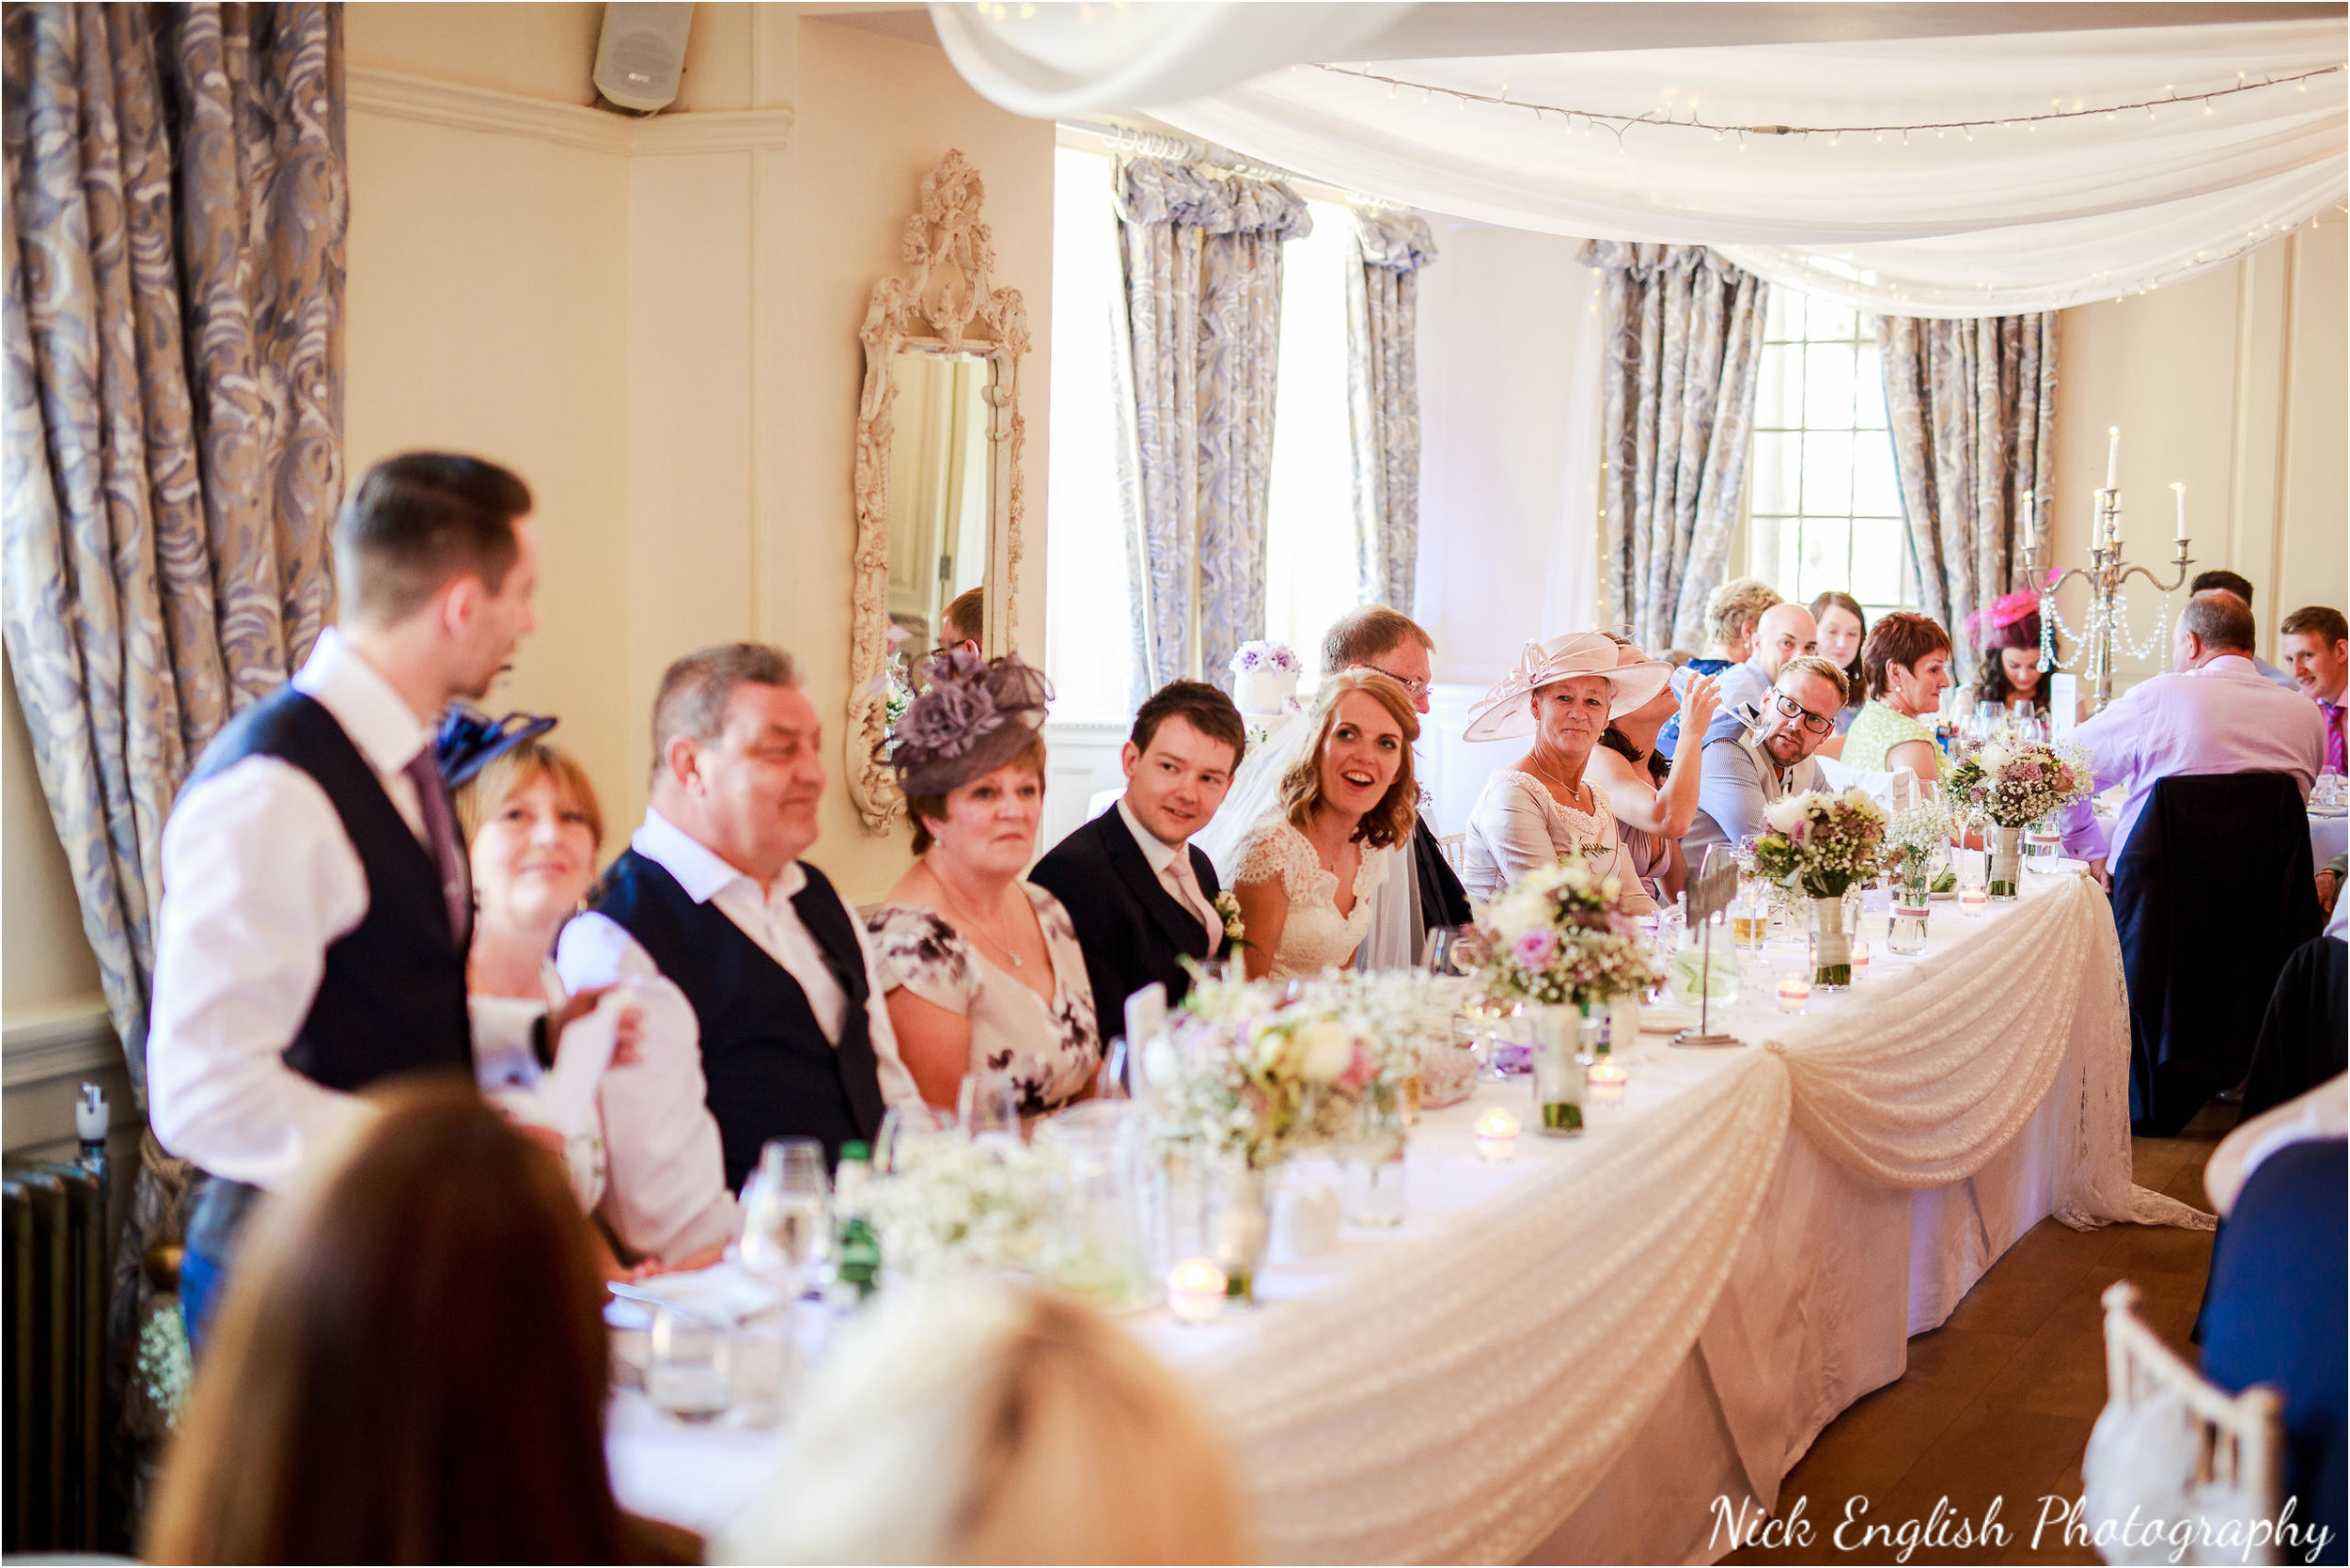 Alison James Wedding Photographs at Eaves Hall West Bradford 179jpg.jpeg